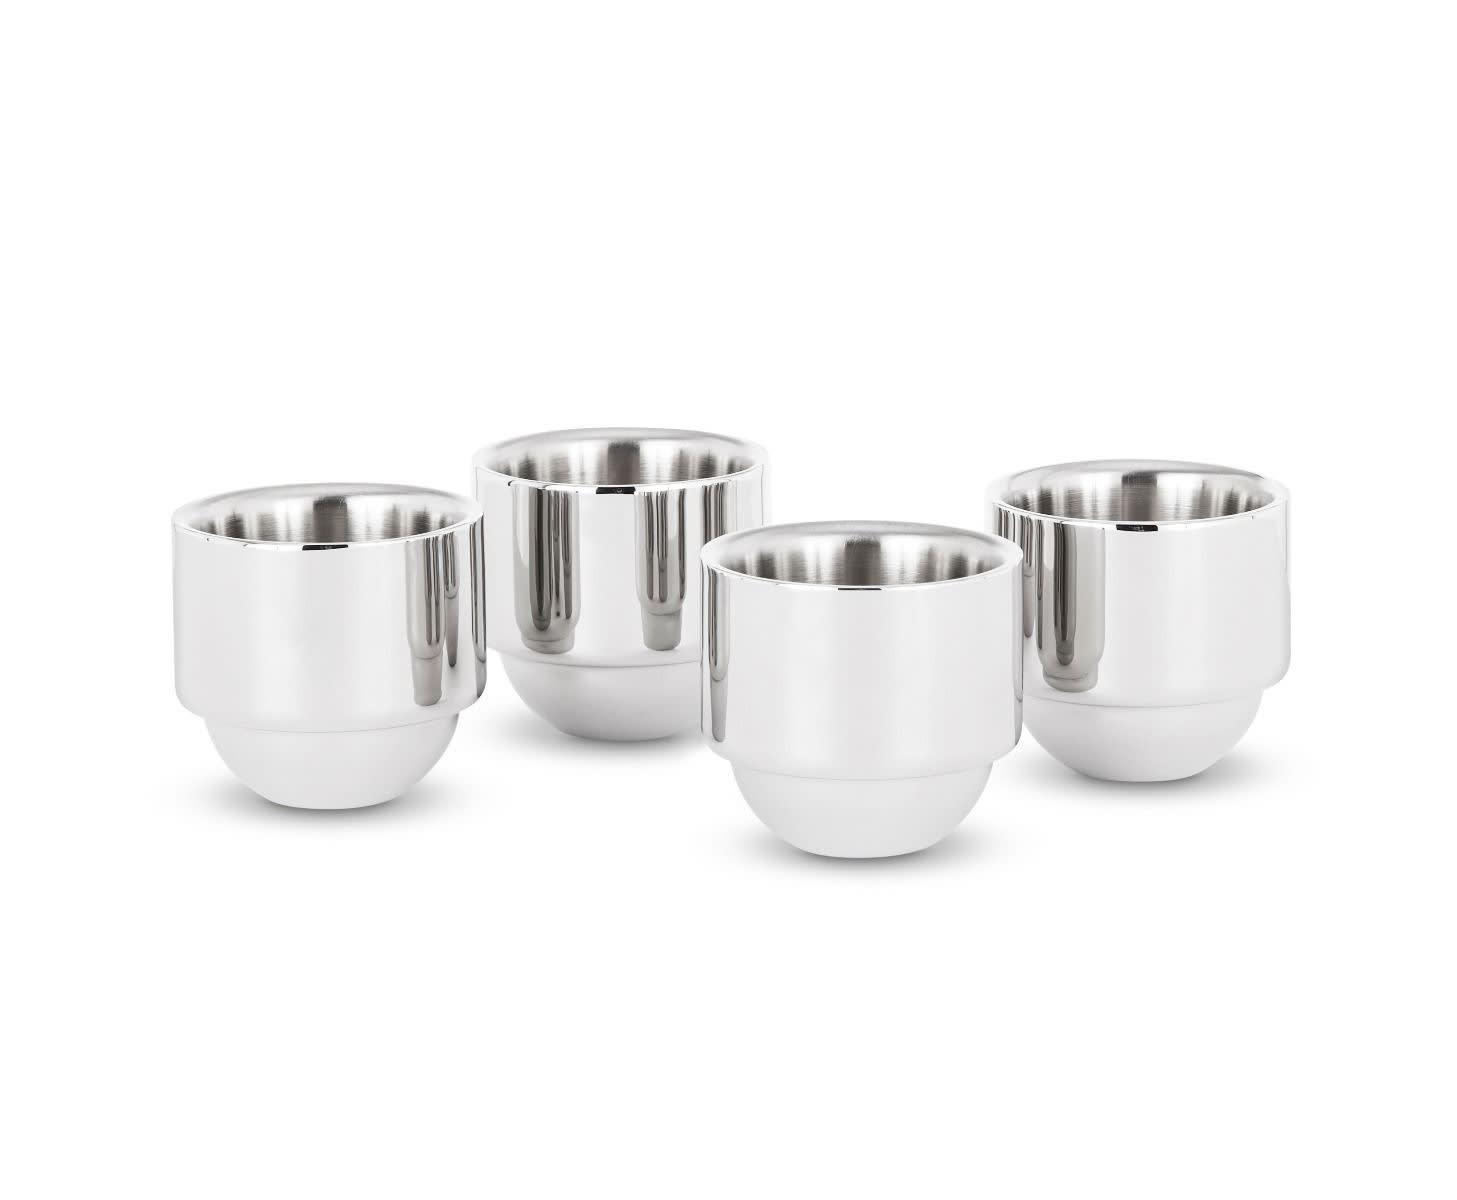 tom-dixon-espresso-cups